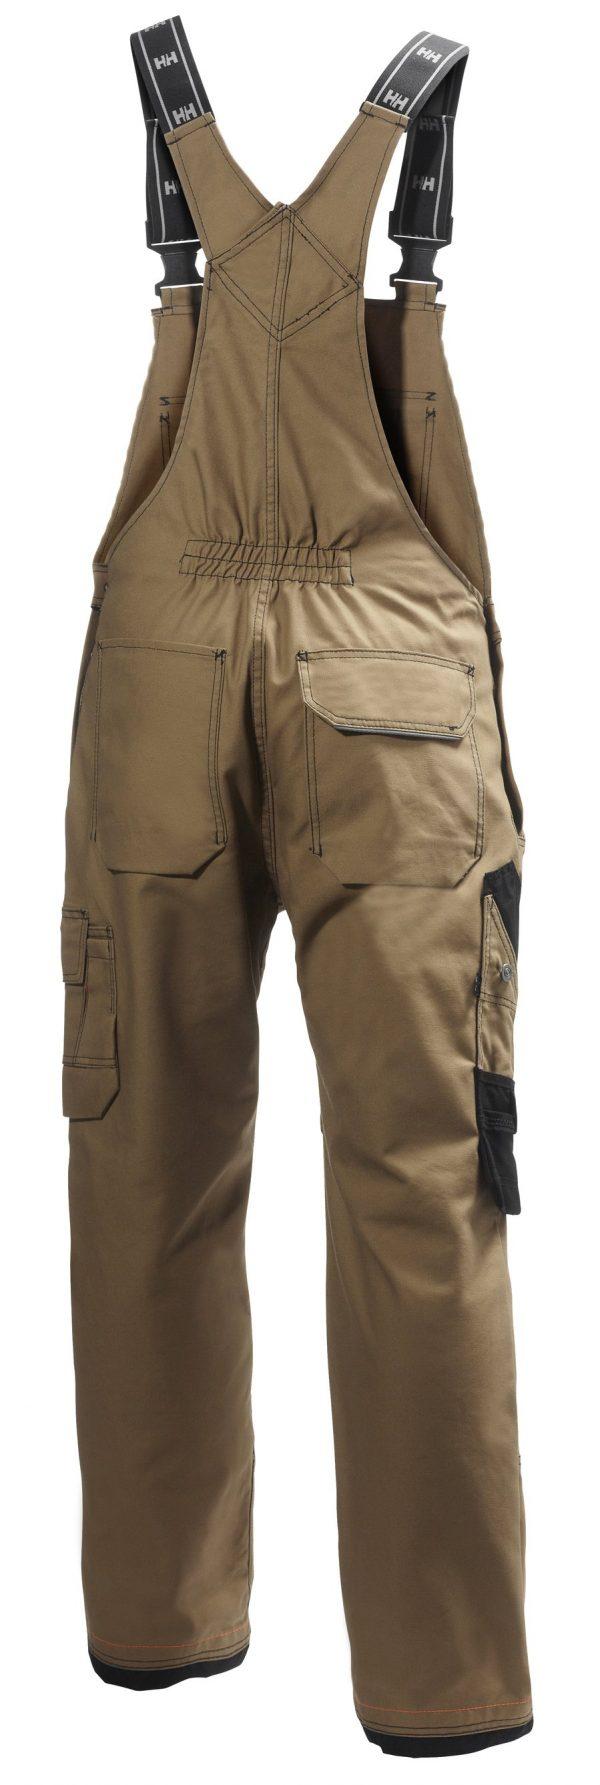 76541 Helly Hansen Workwear Men's Chelsea Construction Bib Pant w/ Cordura® Reinforcement, Hammer Holster & Hanging Pockets, Timber Back